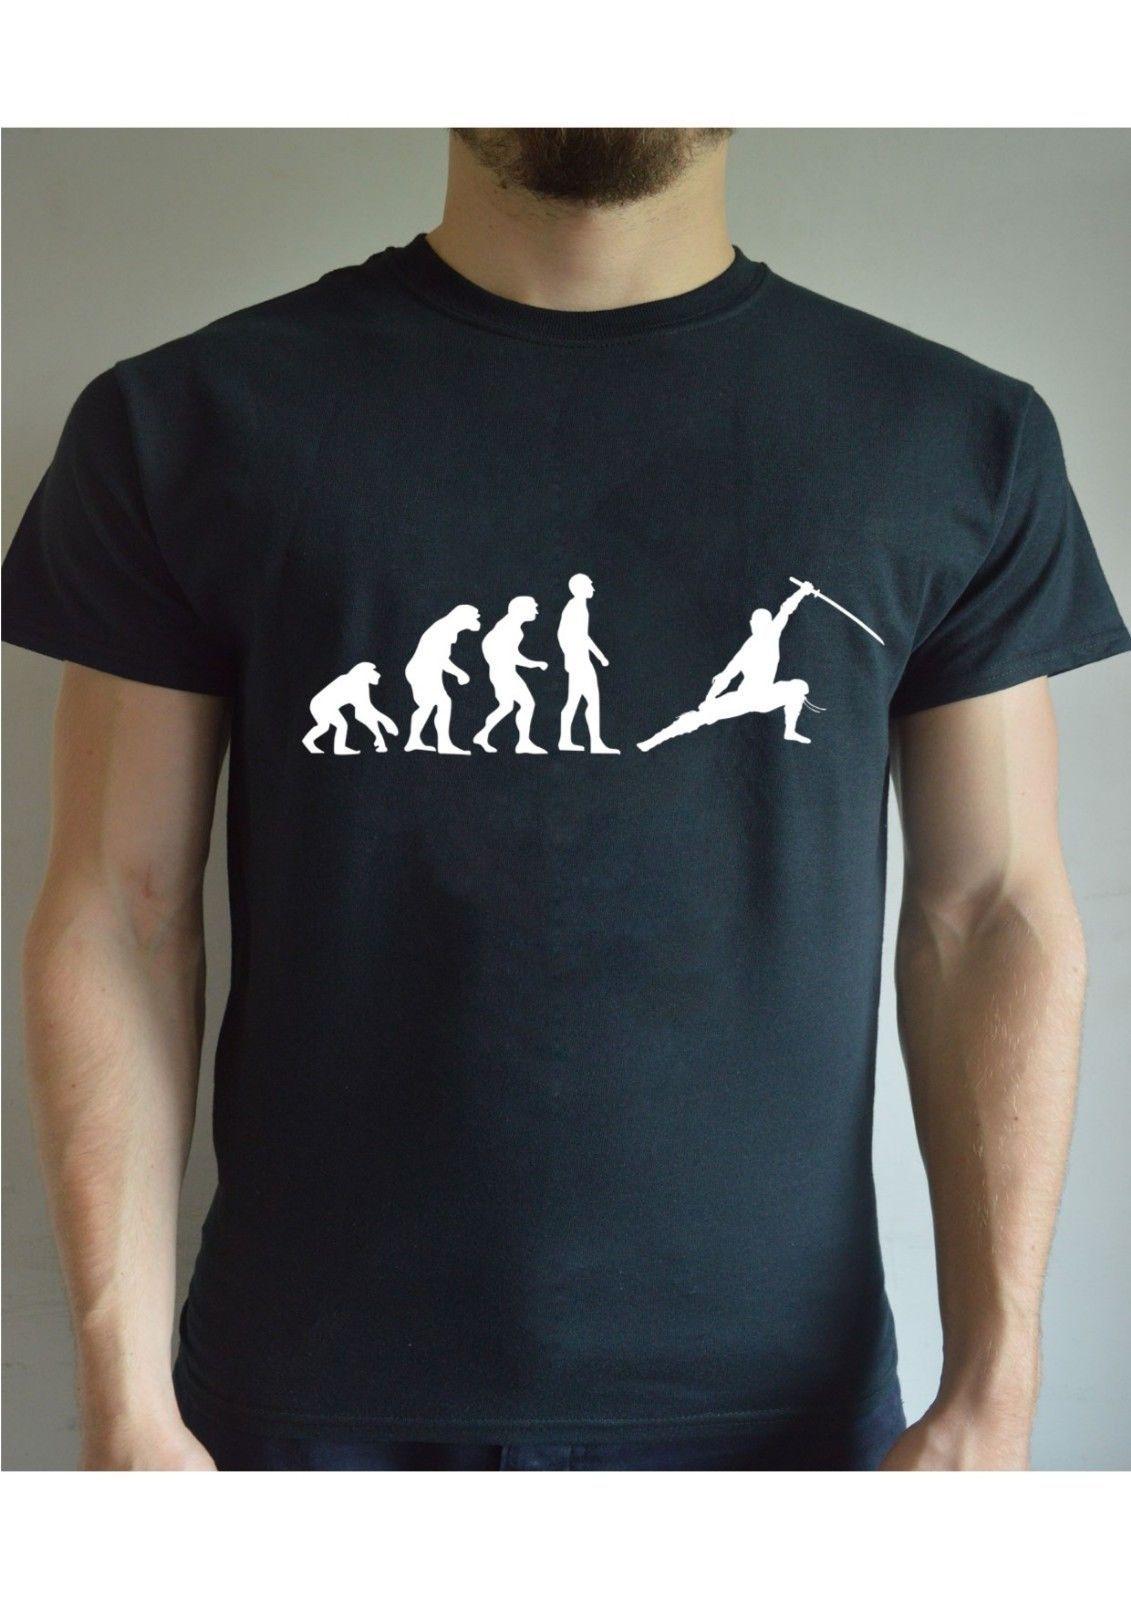 f1c74011b Funny Printed T Shirt Evolution Ninja Sword Martial Arts Christmas Present  Joke 100% Cotton Casual Printing Short Sleeve Men T Shirt Latest T Shirt  Designs ...